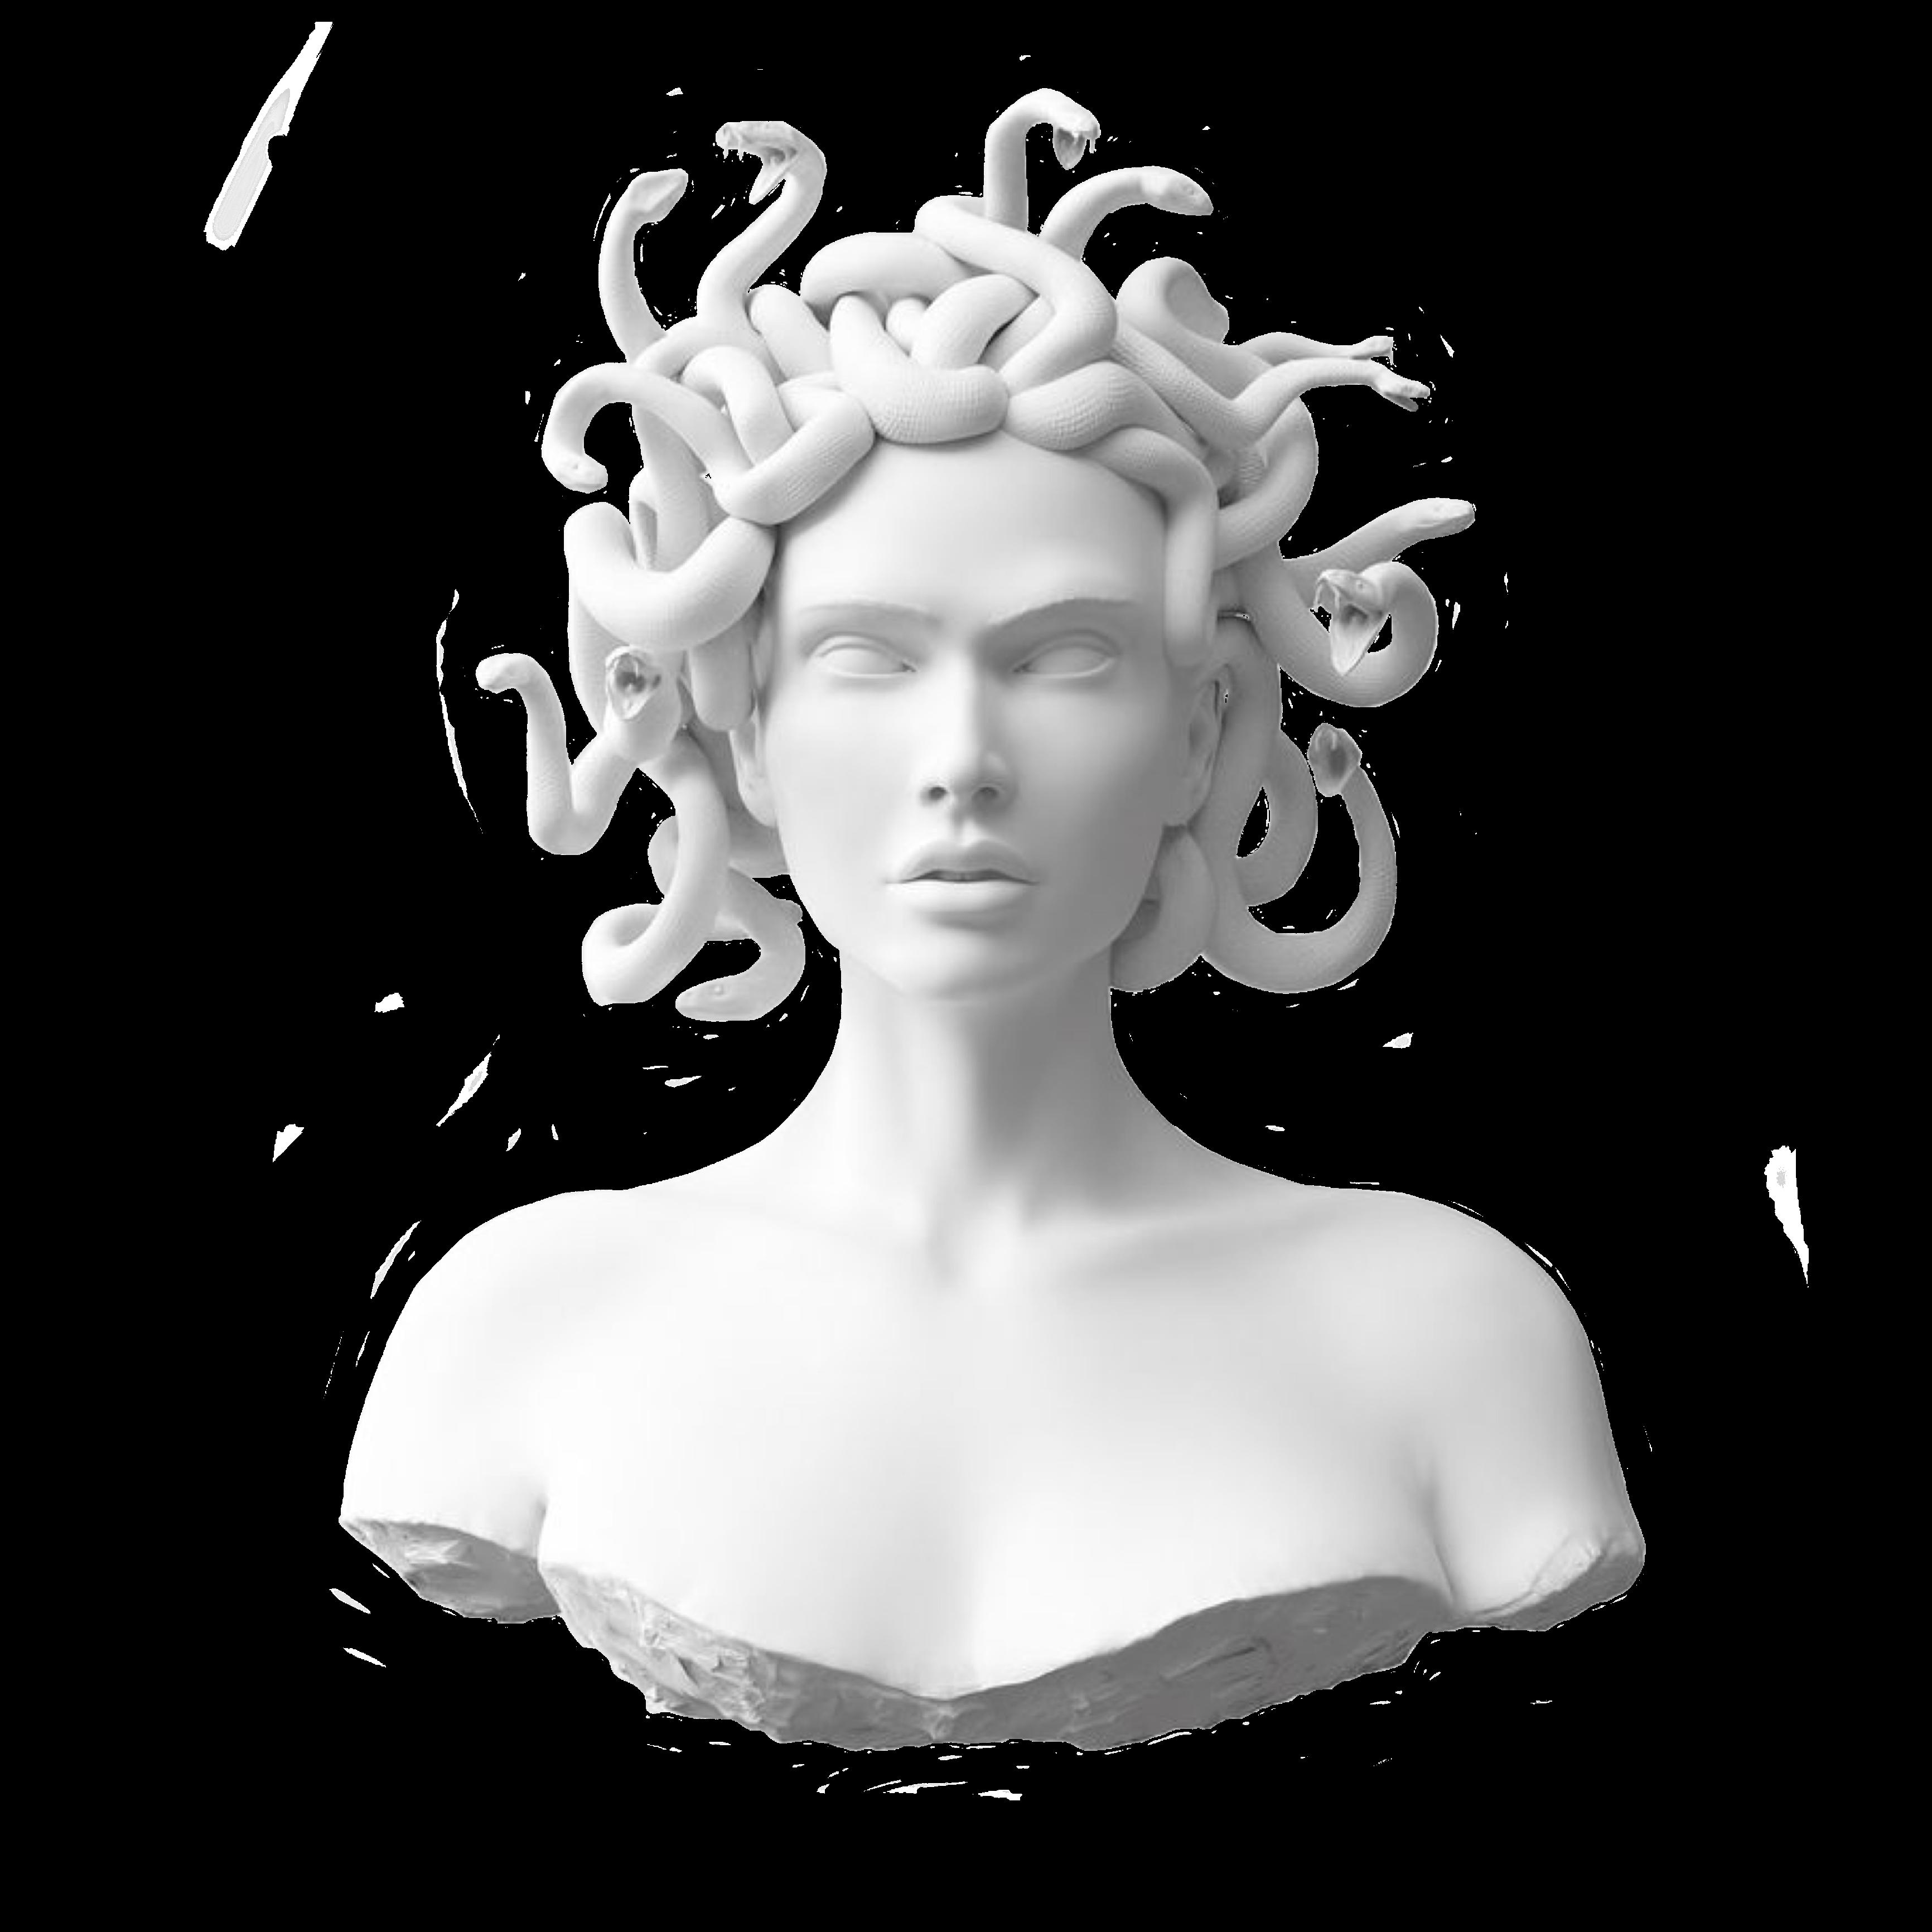 Freetoedit Madusa Snakes Bust Mythology Greek Sculpture Greek Statues Art